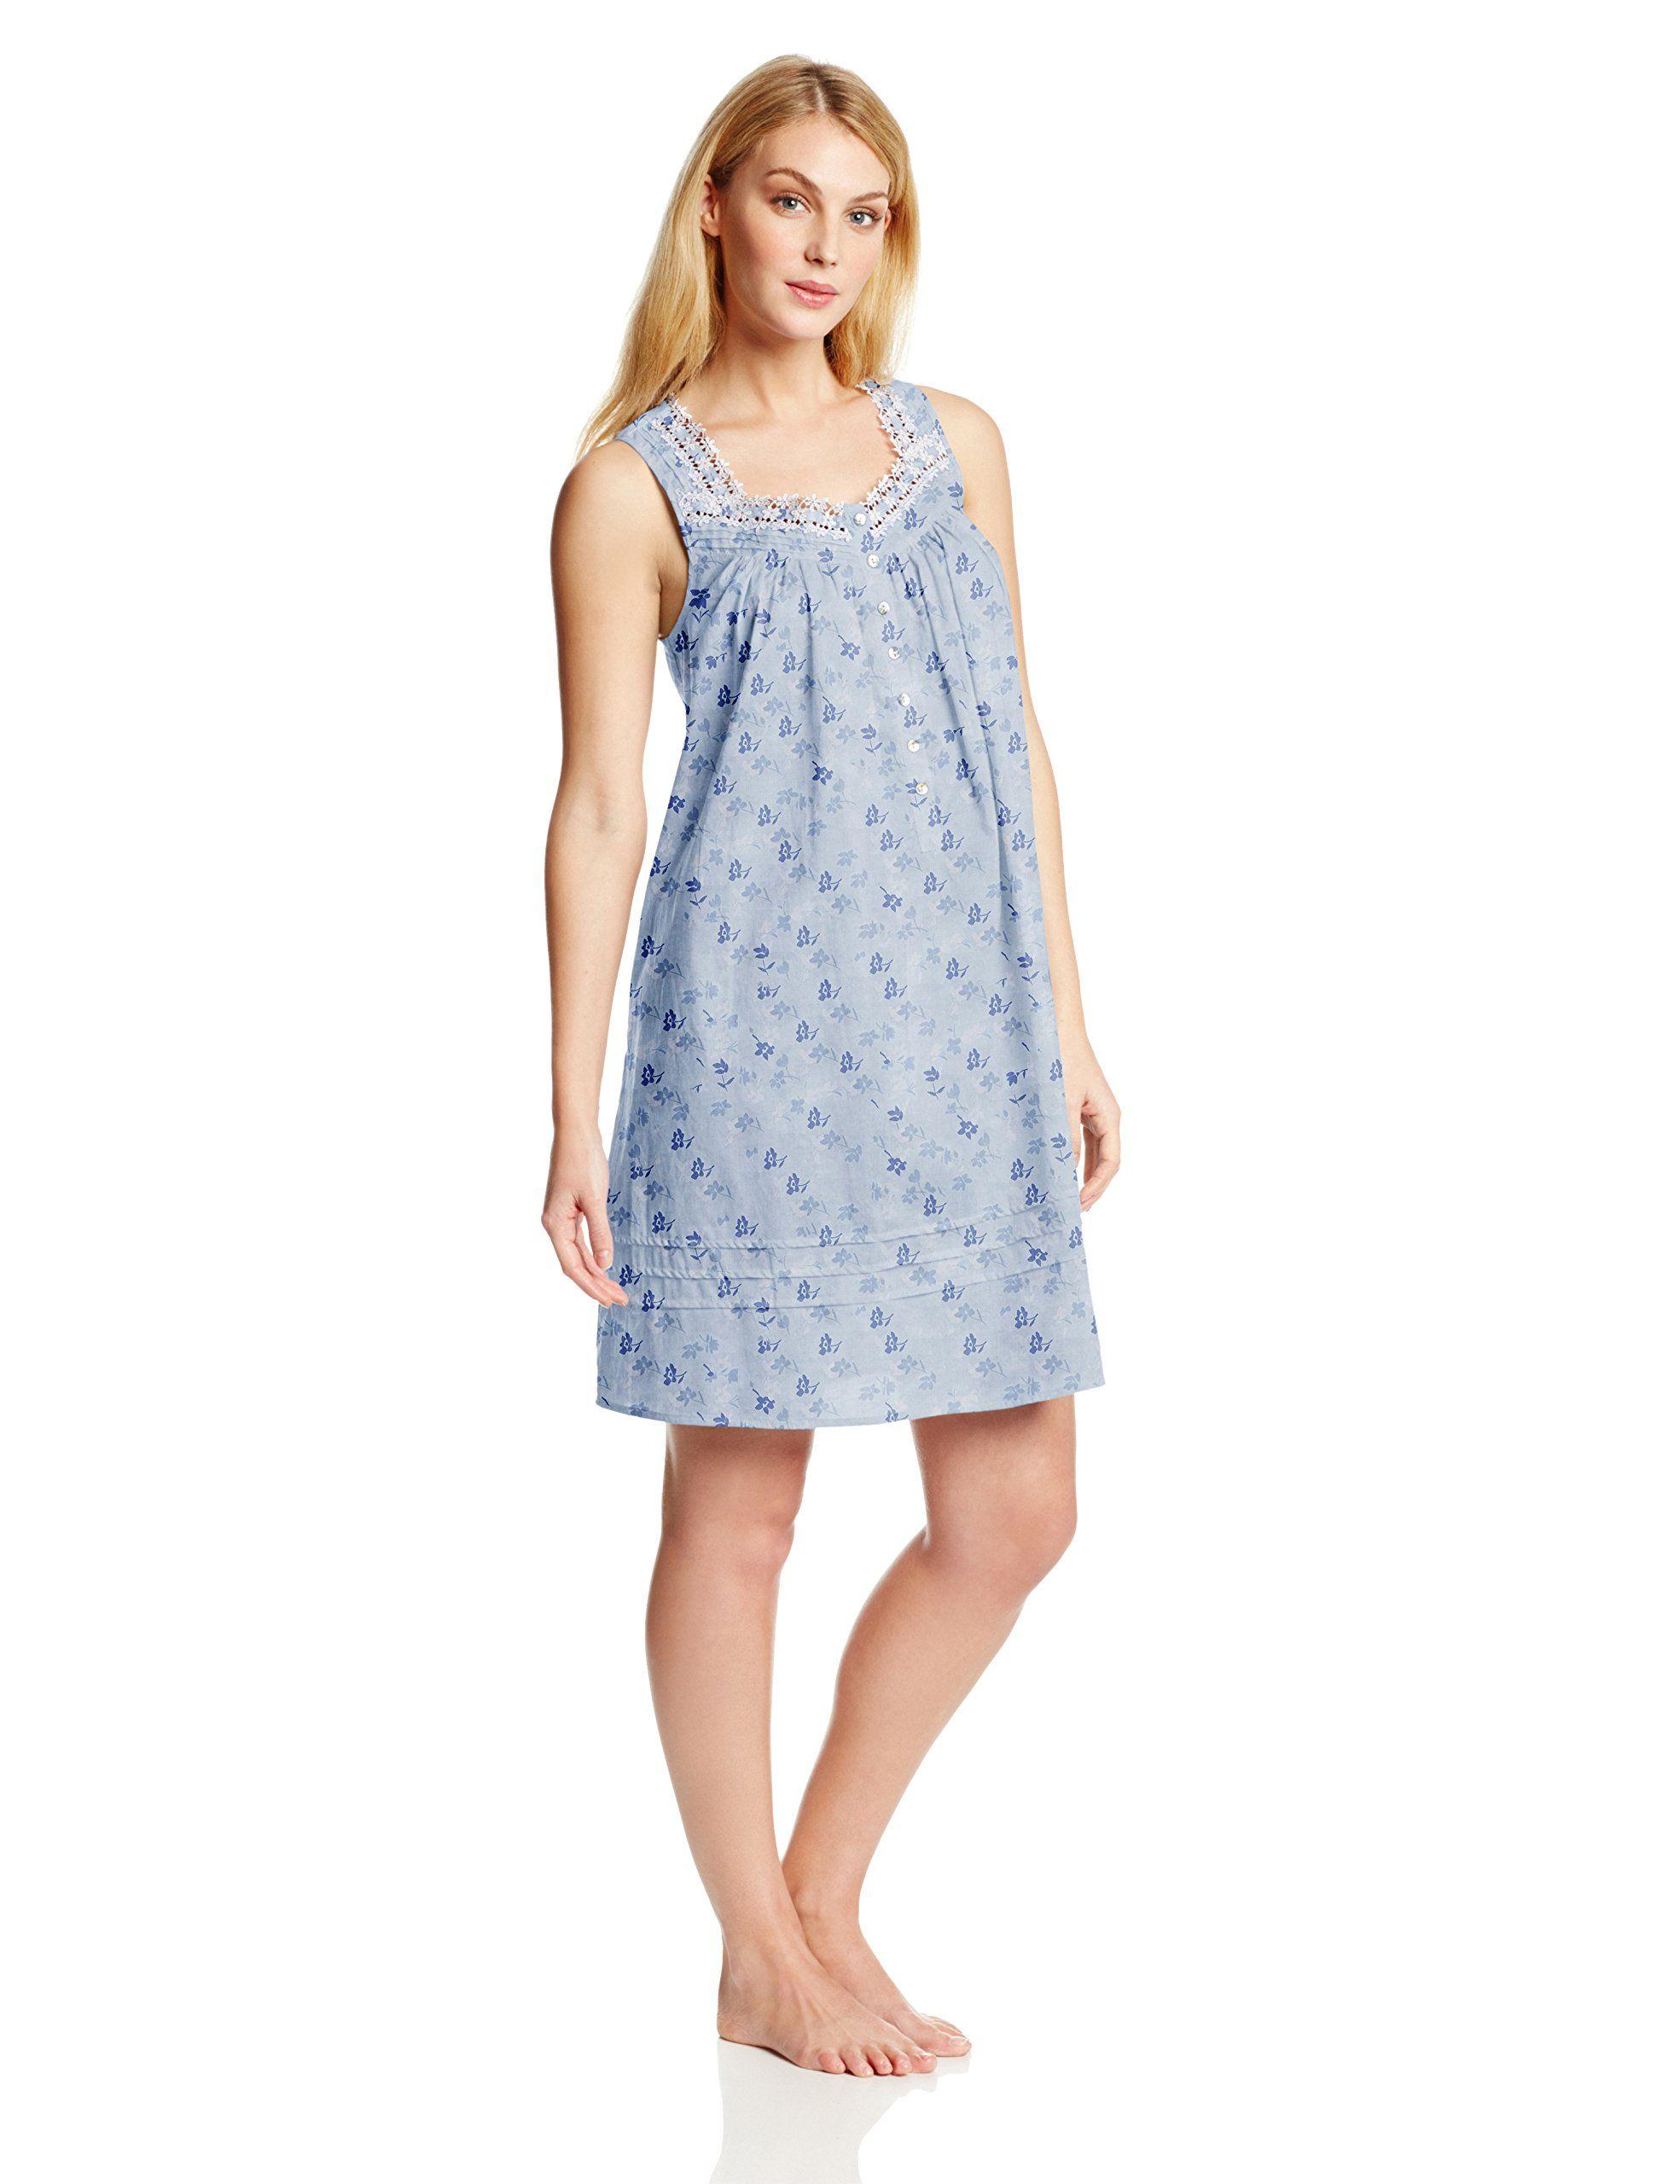 Eileen West Women's Cotton Lawn Nightgown, Blue Floral, XS